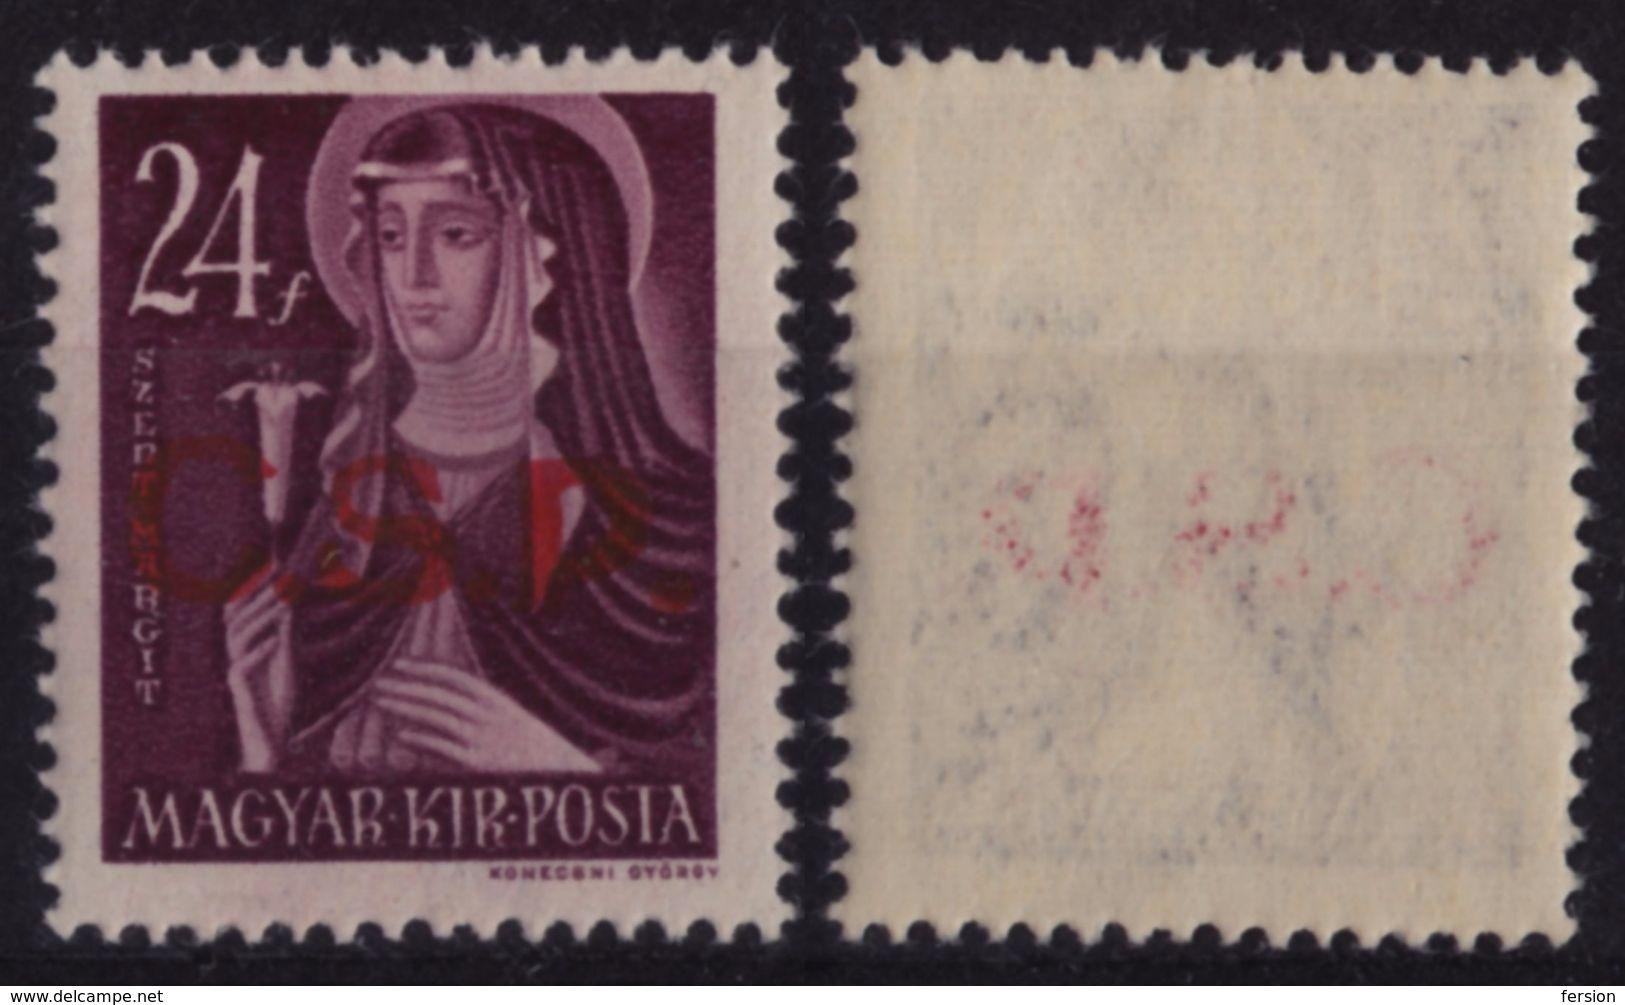 1945 Czechoslovakia / CCCP Occupation - Hungary - Rimaszombat Rimavska Sobota - St. Margaret Overprint C.S.P Flower Lily - Ongebruikt